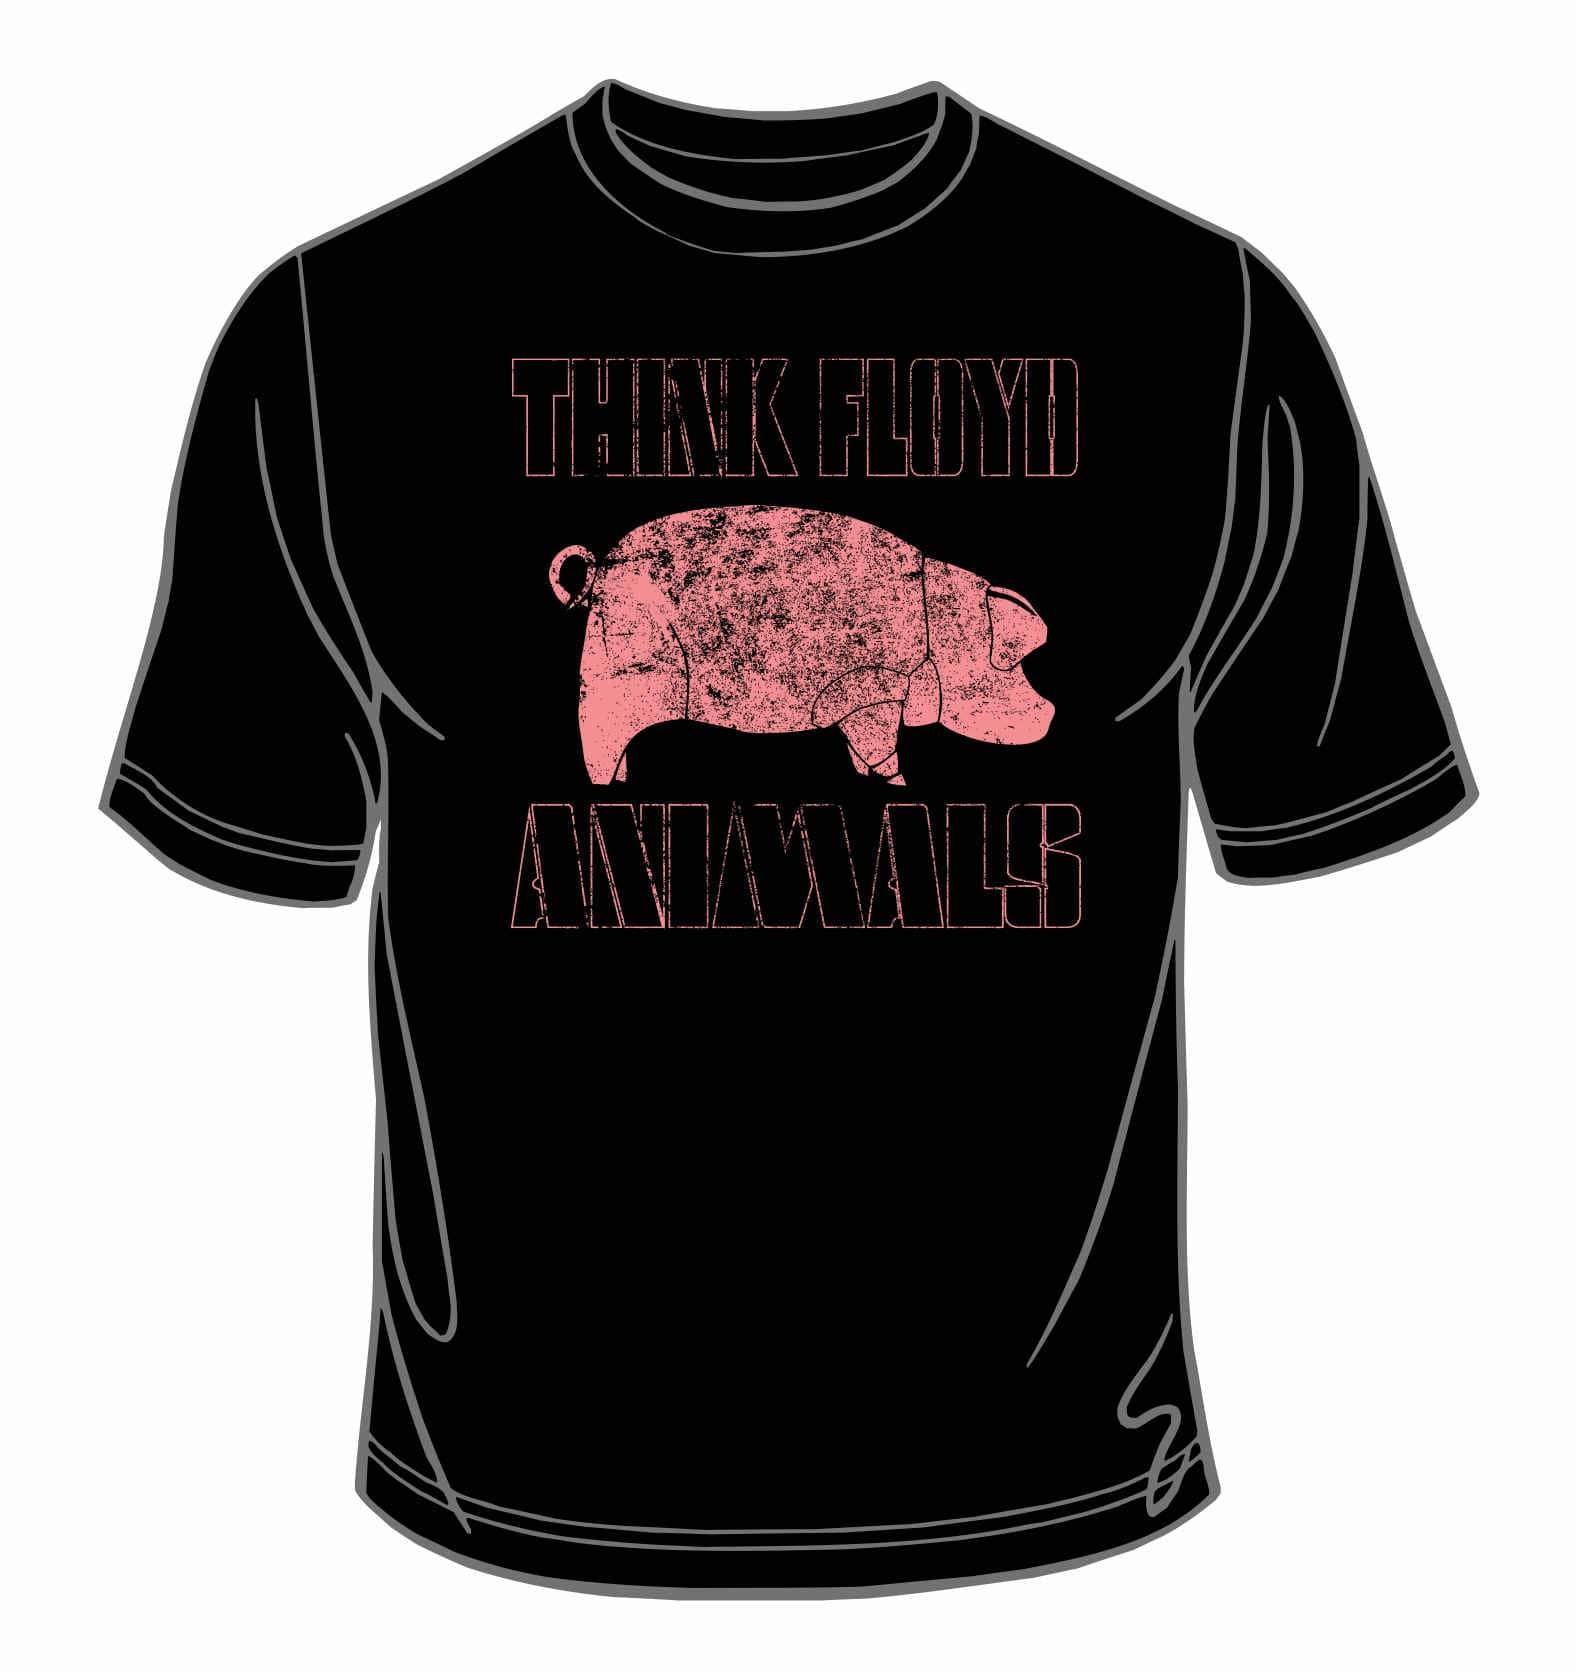 ANIMALS T-shirt  Black